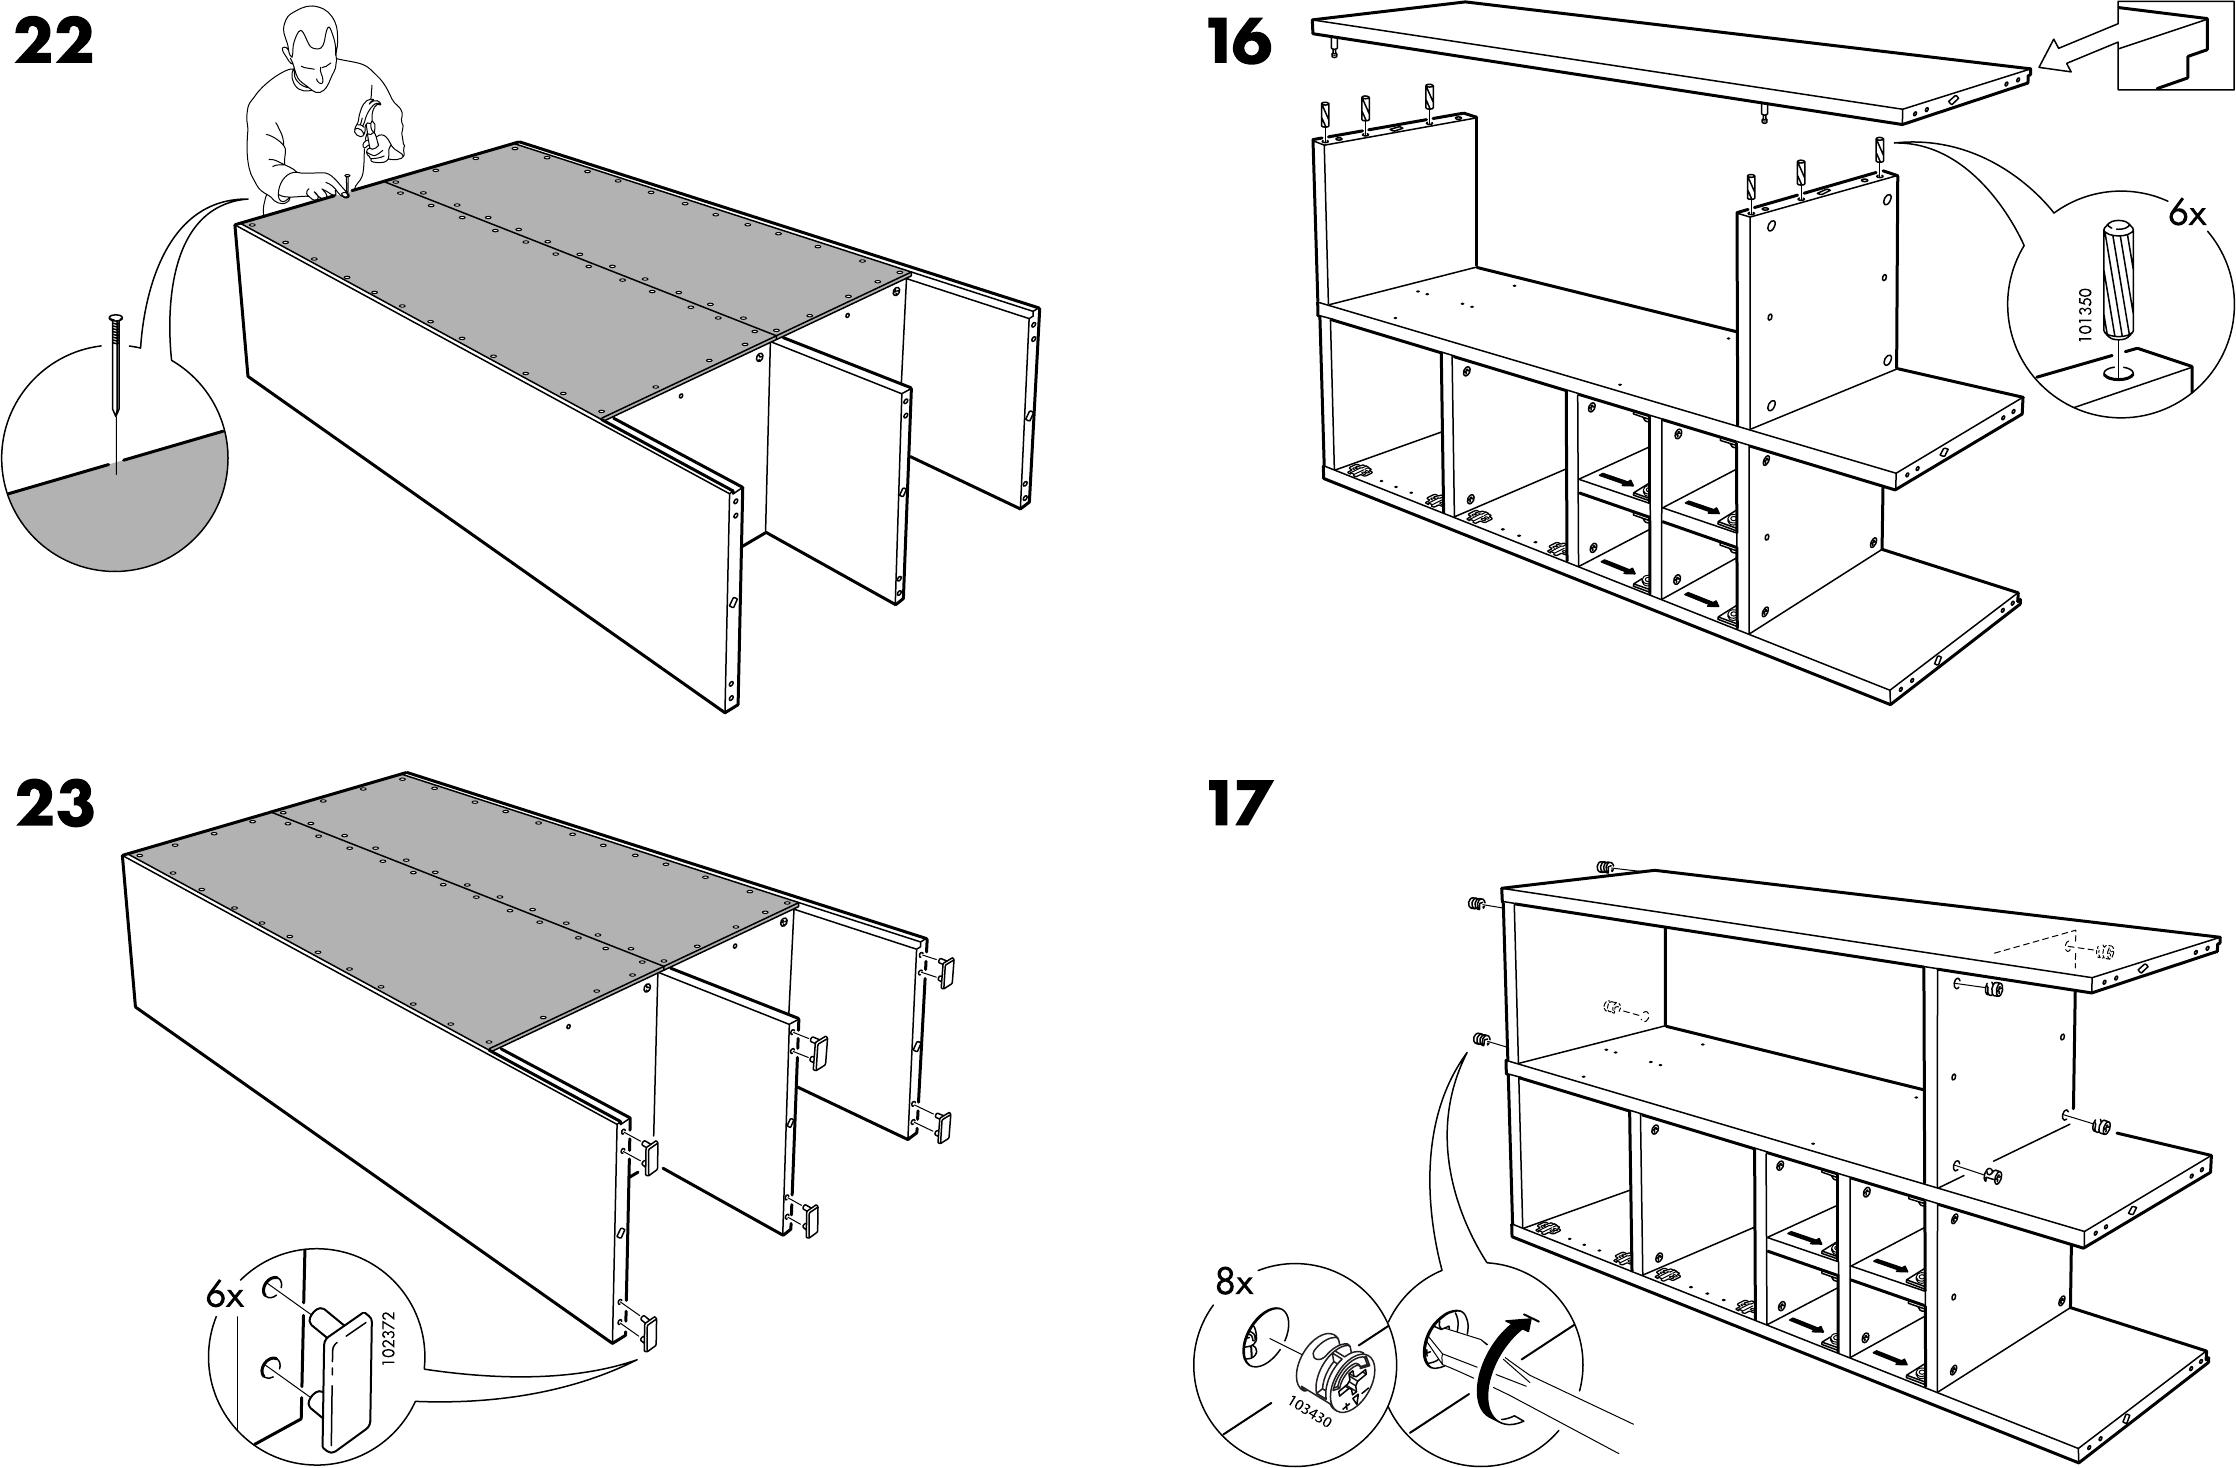 Schreibtisch Ikea Weiß Billig ~ Handleiding Ikea Rakke kast (pagina 11 van 12) (Dansk, Deutsch